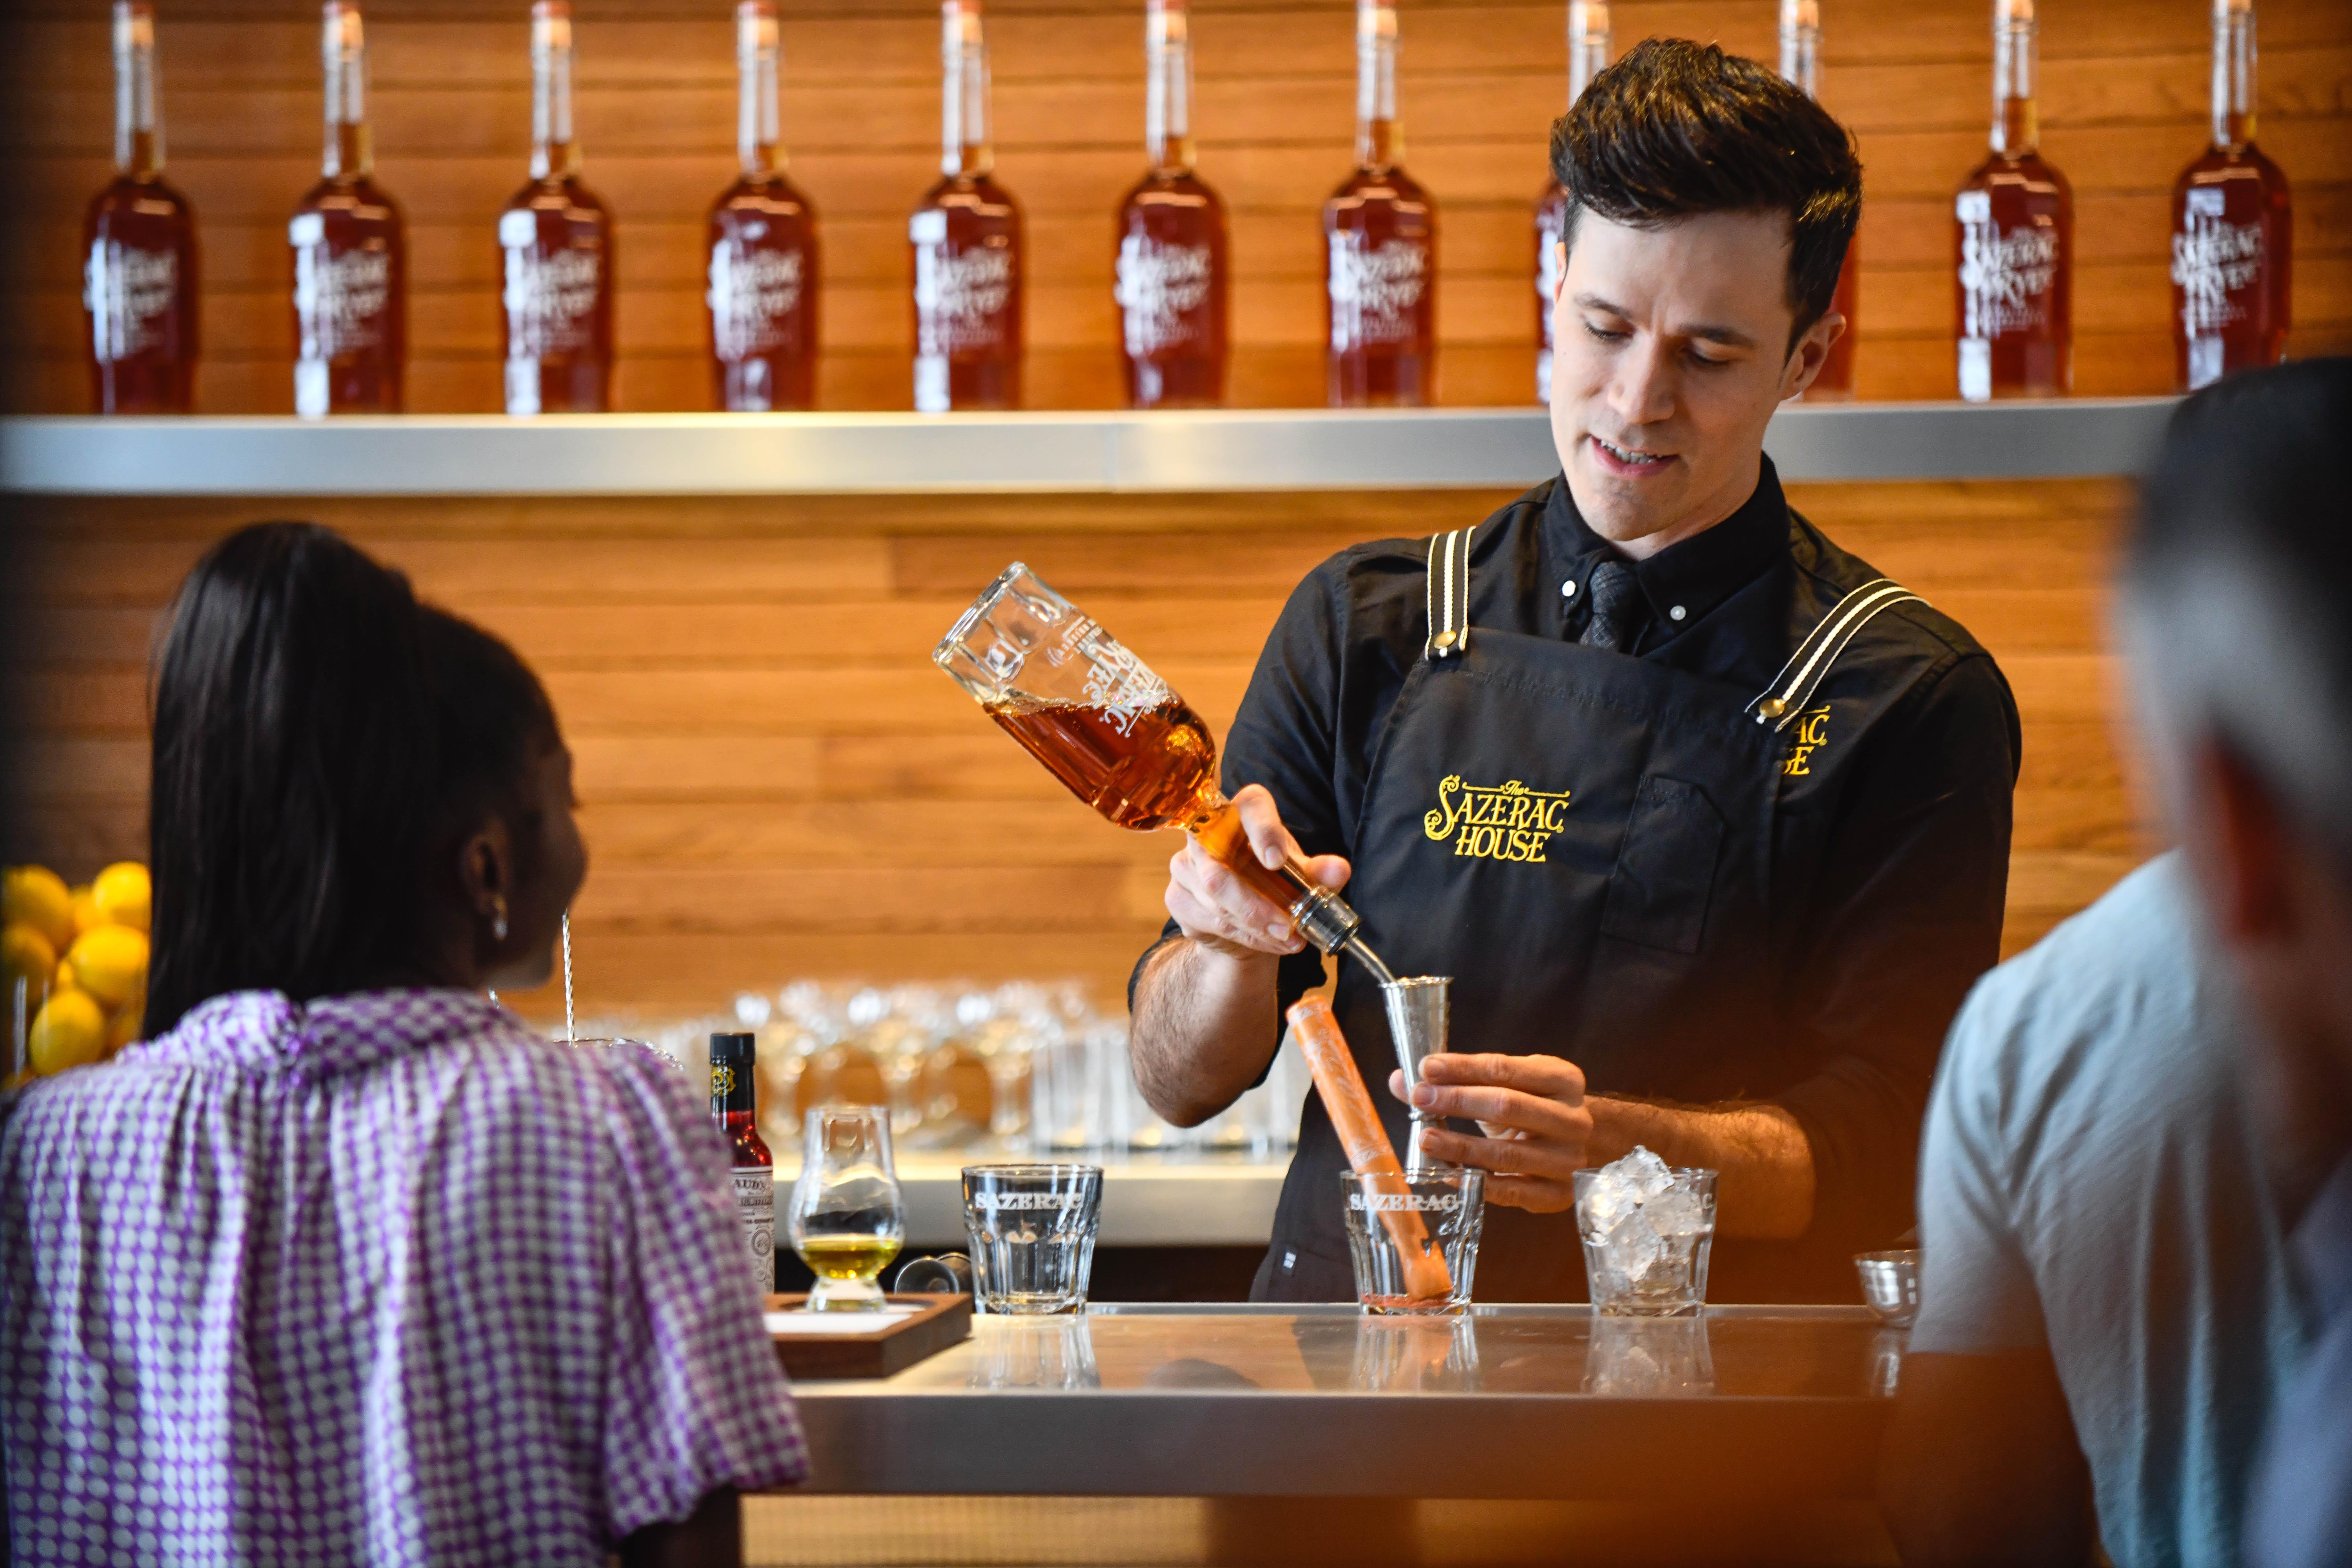 Sazerac Cocktail in the Making